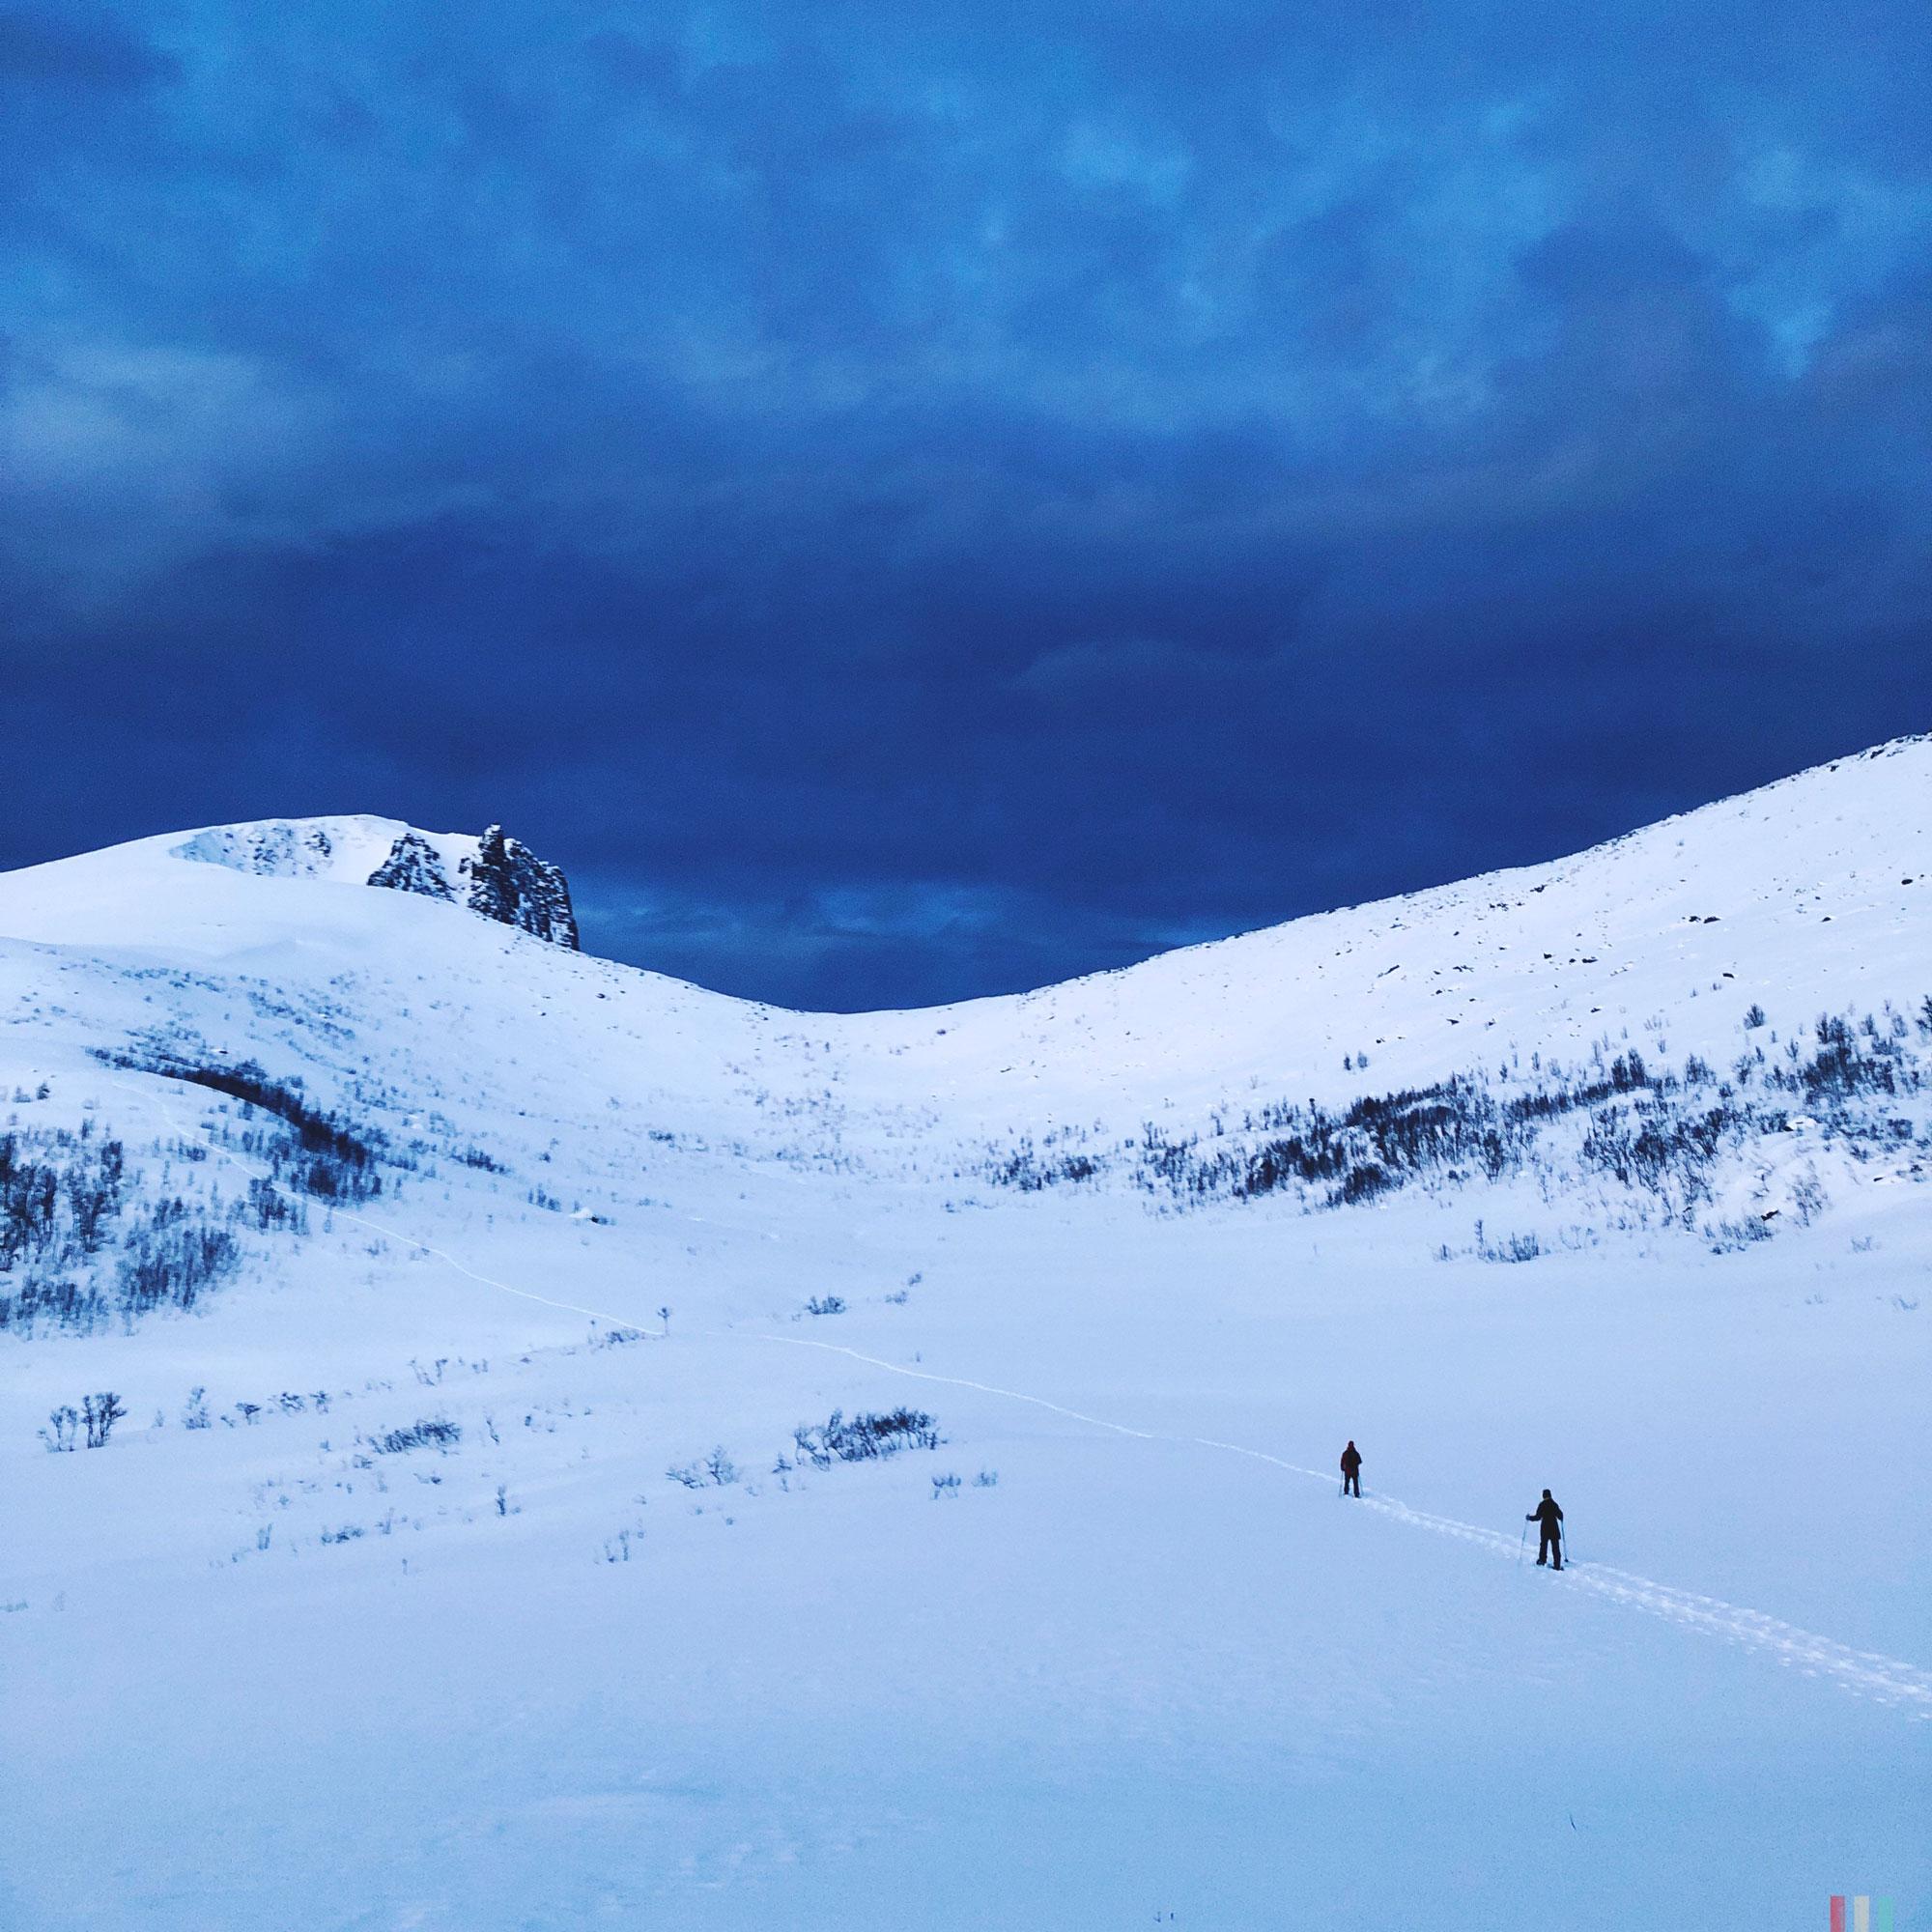 norwegen-senja-wandern-blick-ins-tal.jpg